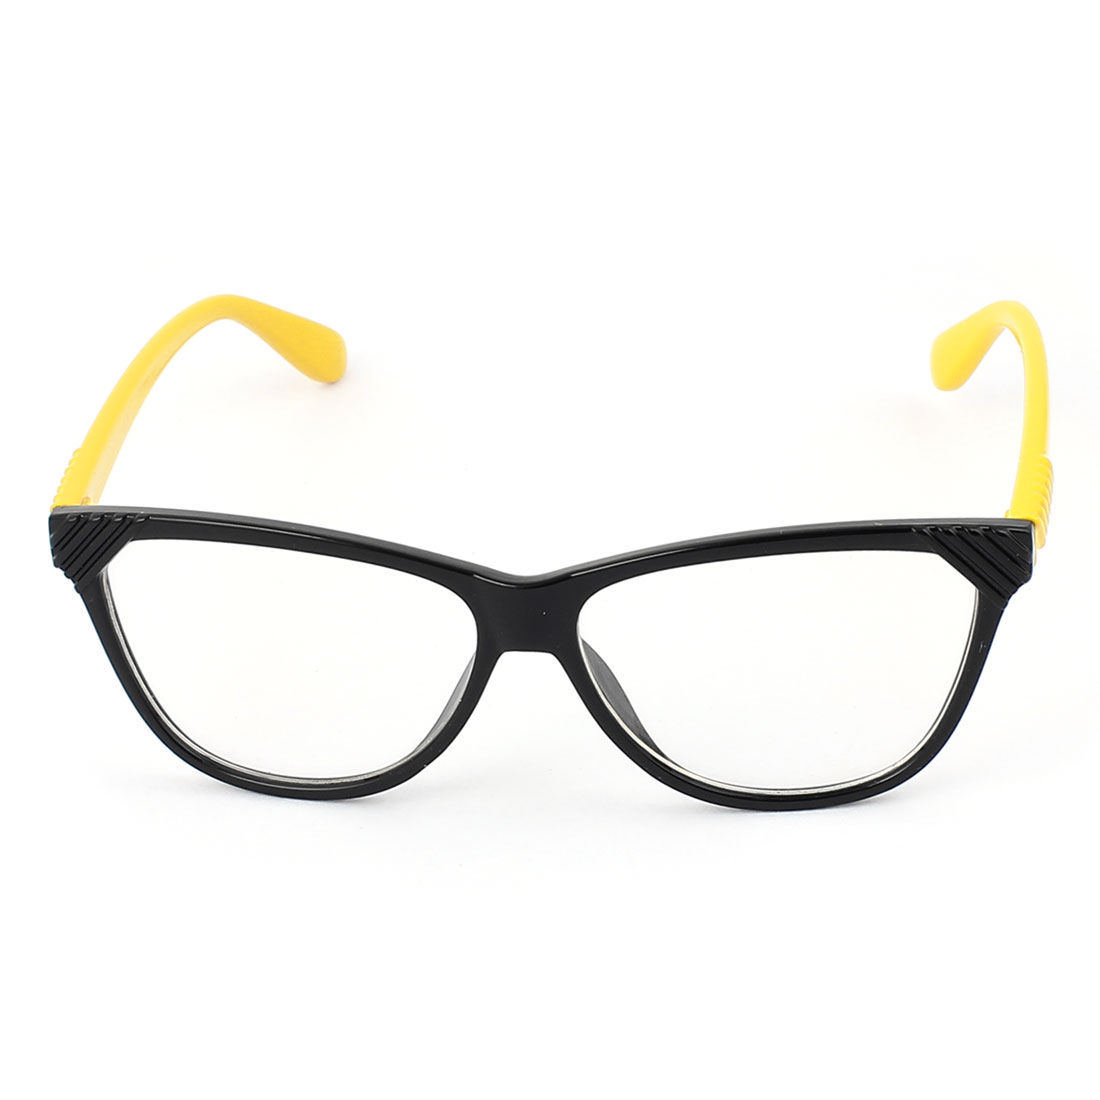 Plastic Arm Single Bridge Clear Lens Plain Glasses Eyeglasses Plano Spectacles Yellow